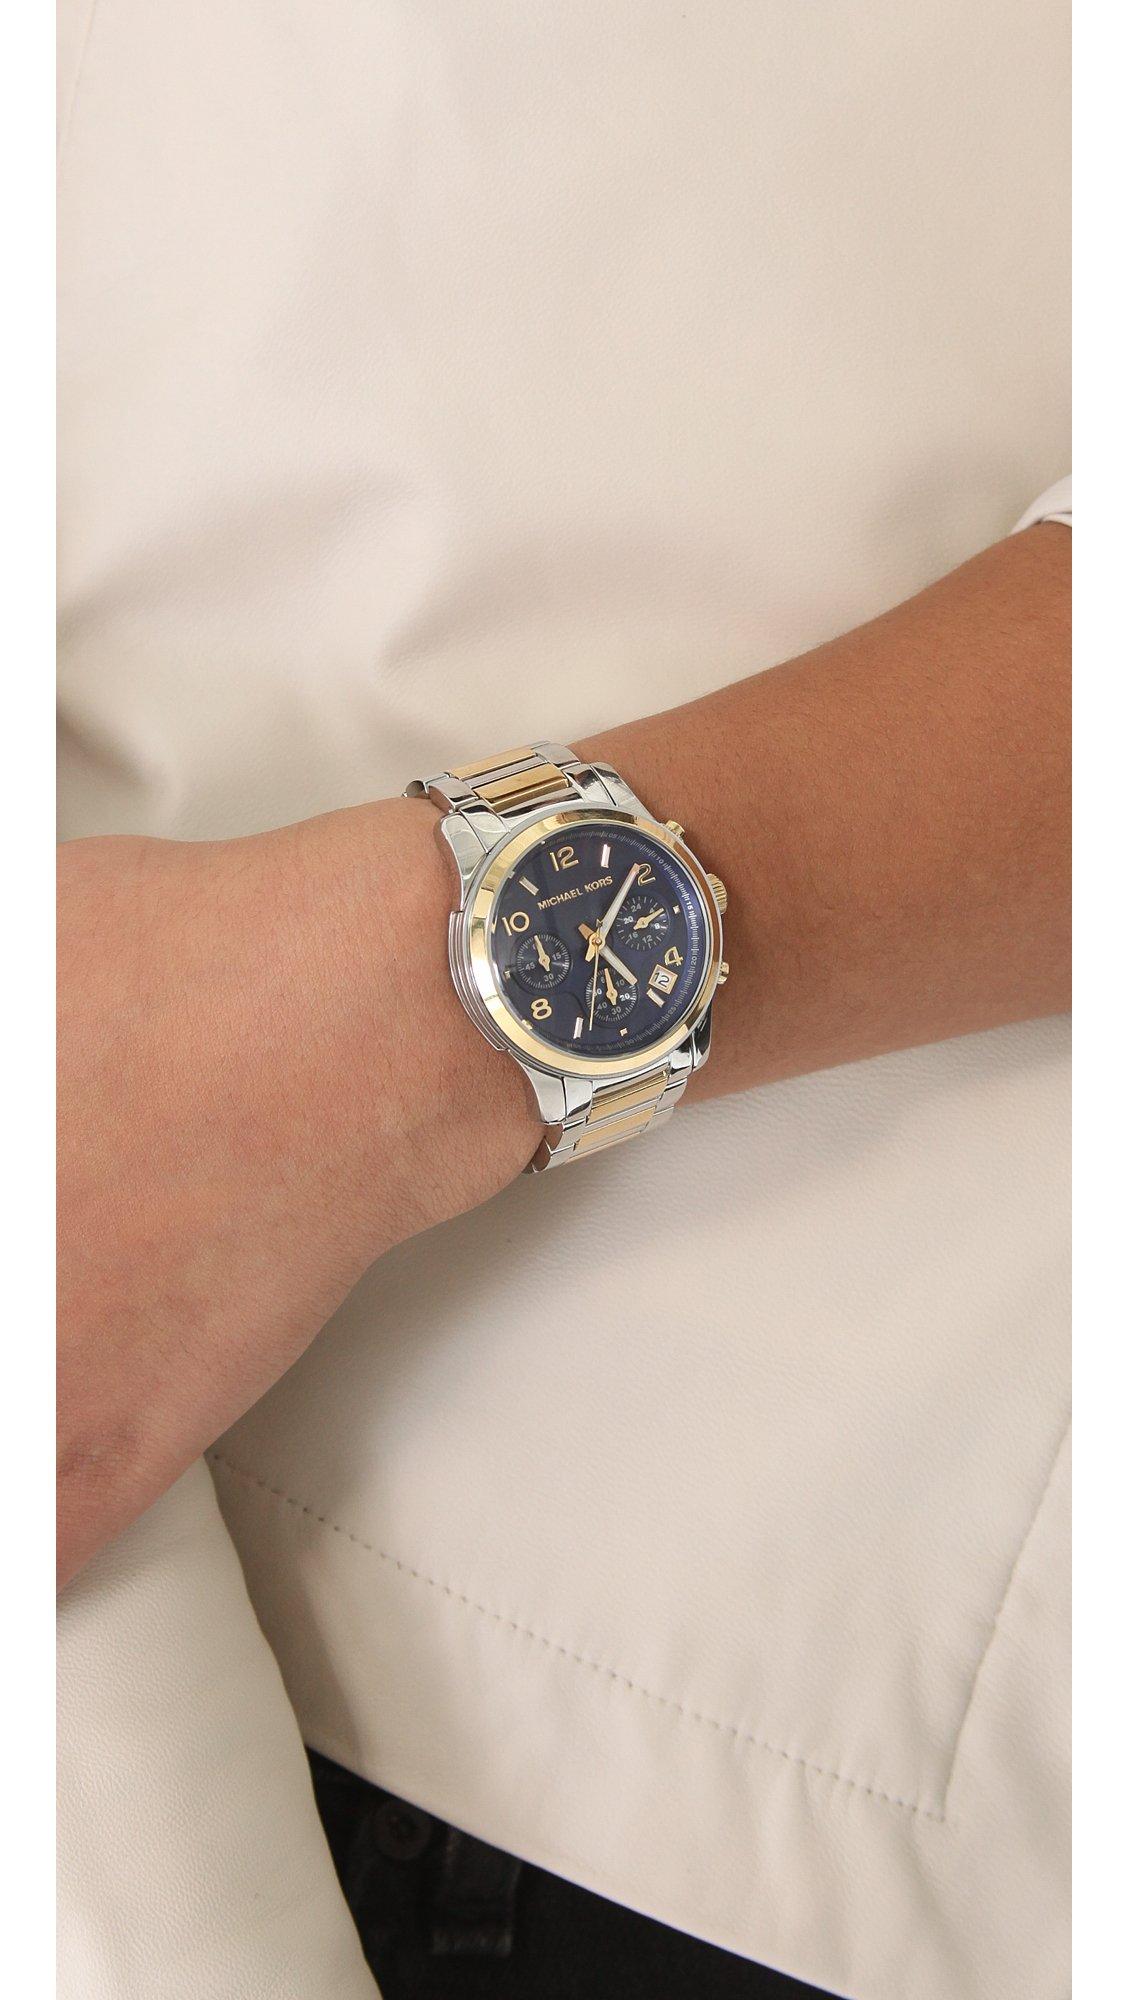 6b18a34eeadb Lyst - Michael Kors Two Tone Runway Watch in Metallic